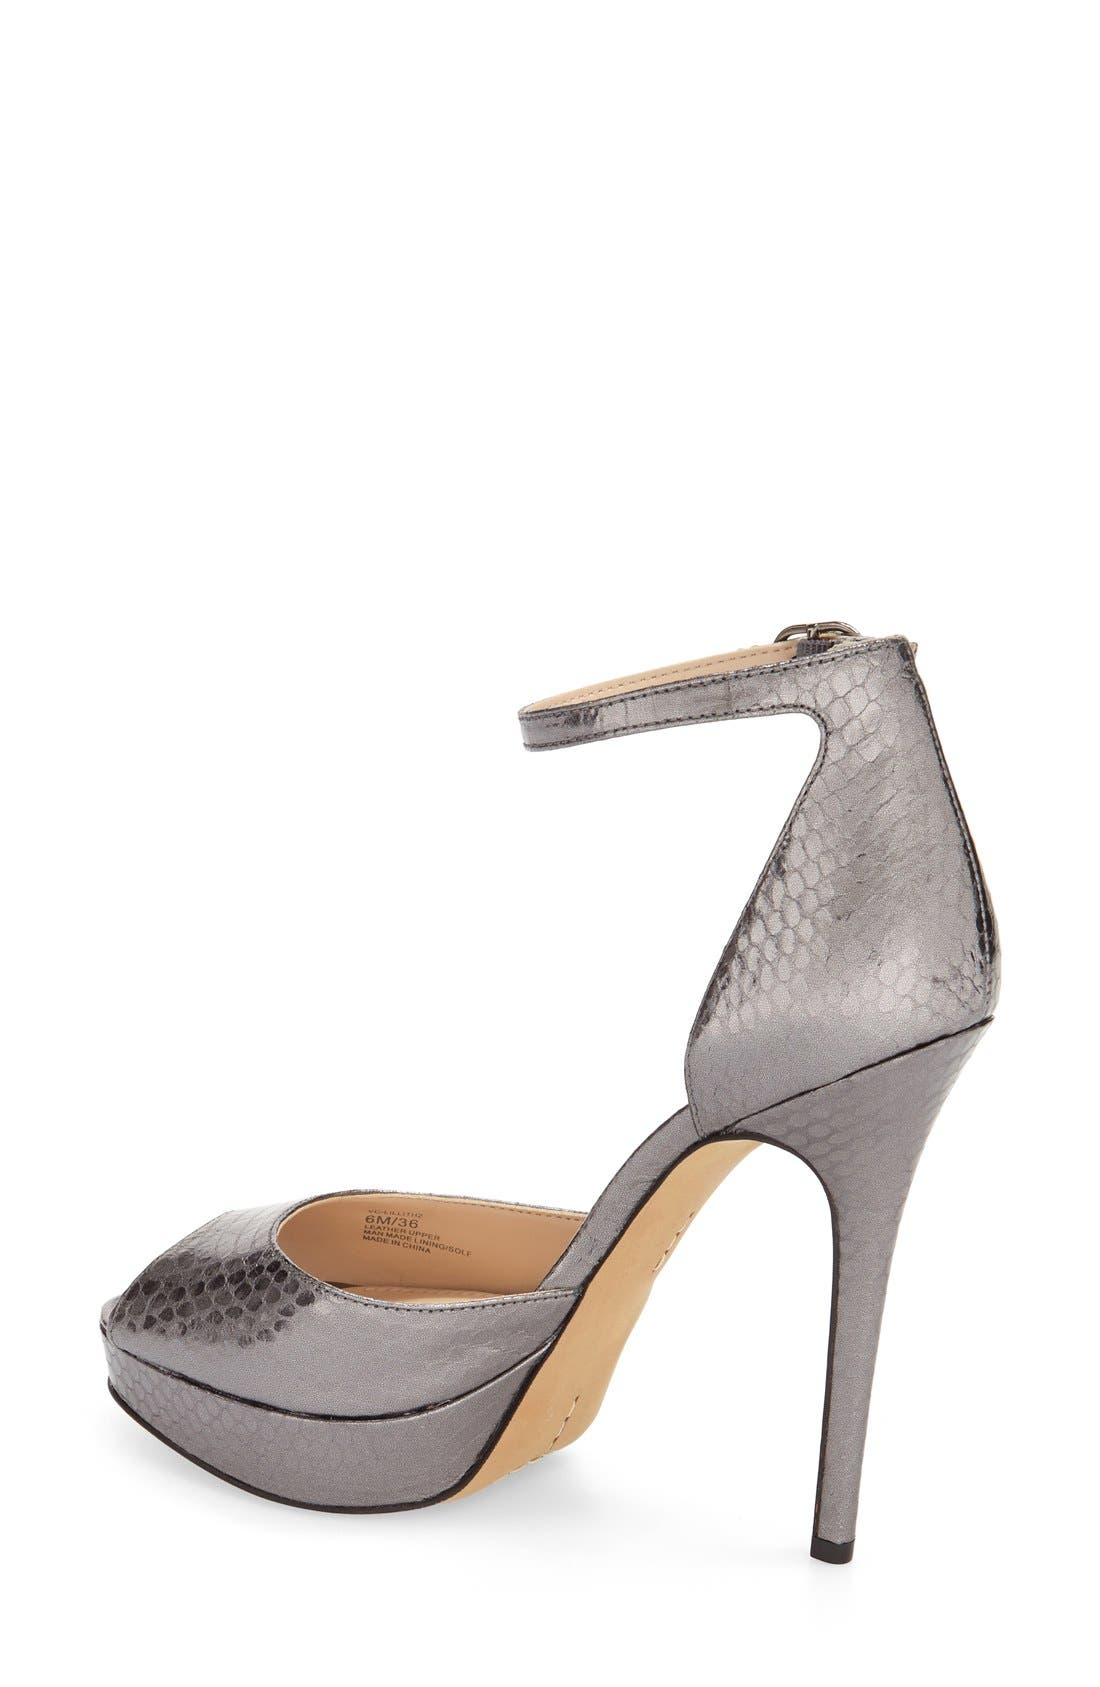 Alternate Image 2  - Vince Camuto 'Lillith' Ankle Strap Platform Pump (Women)